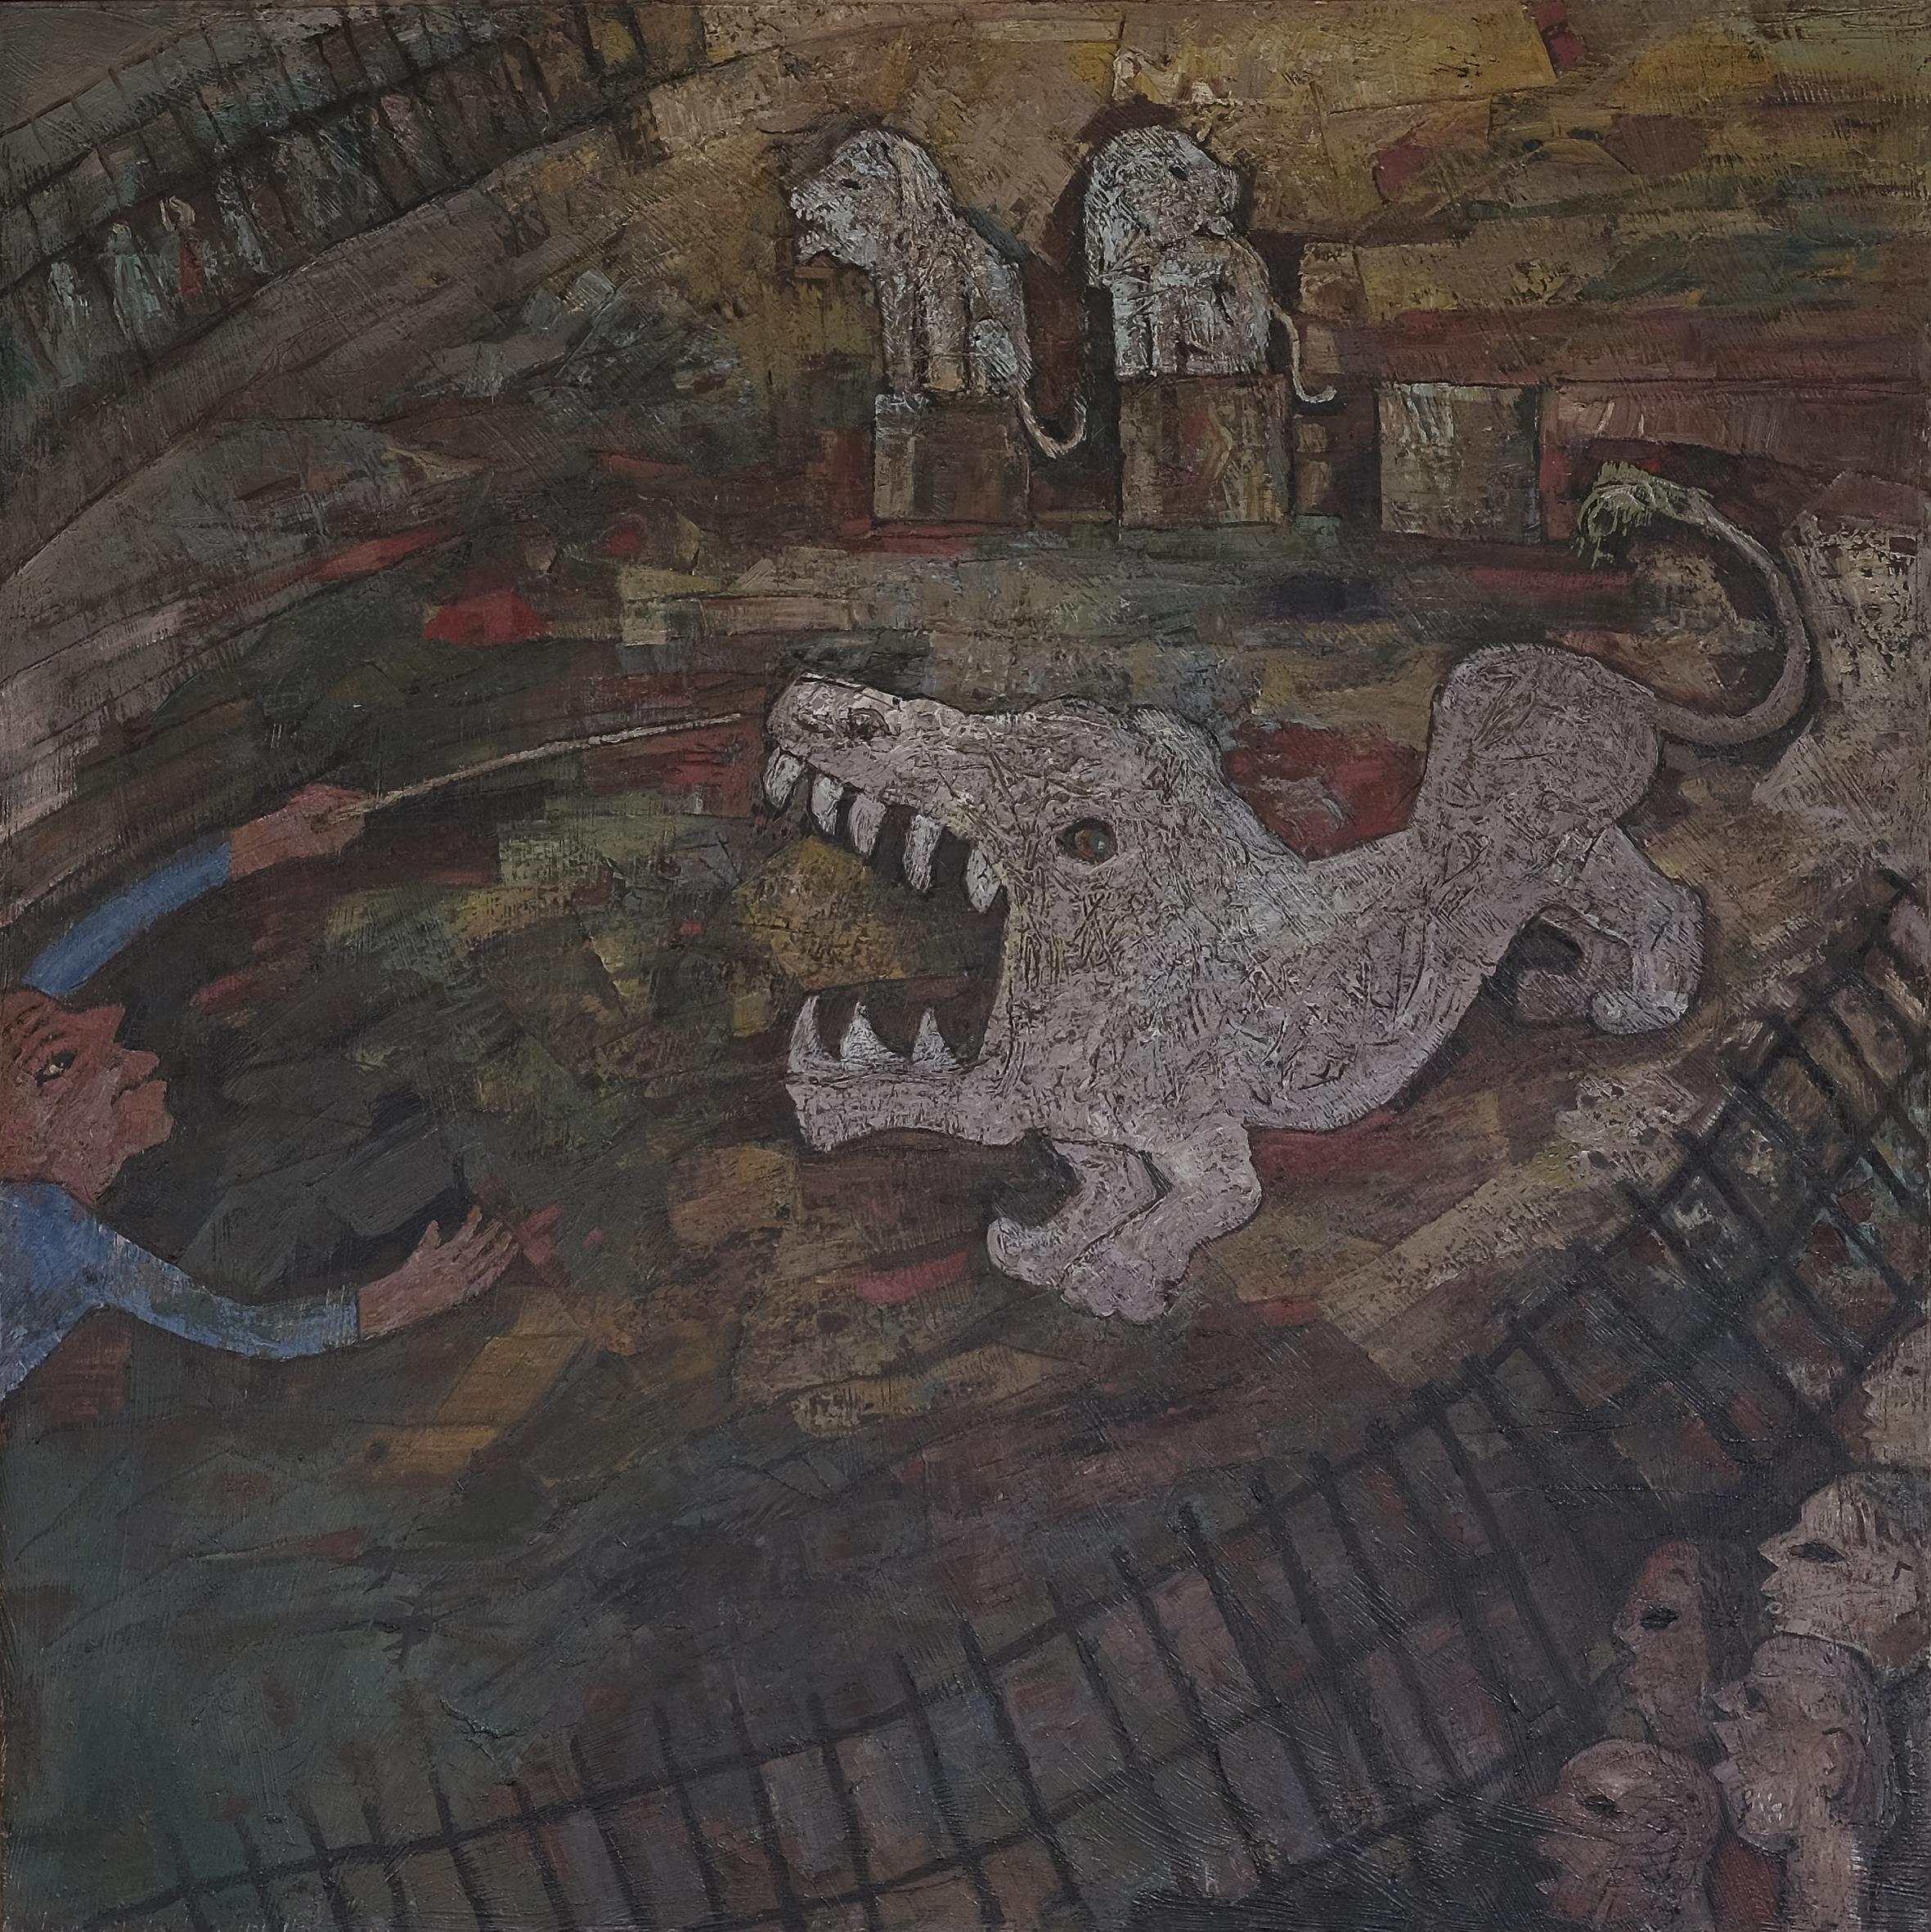 Widayat, Affandi Nonton Sirkus (Affandi Watching Circus), ooc, 136 x 136 cm, 1991.jpeg